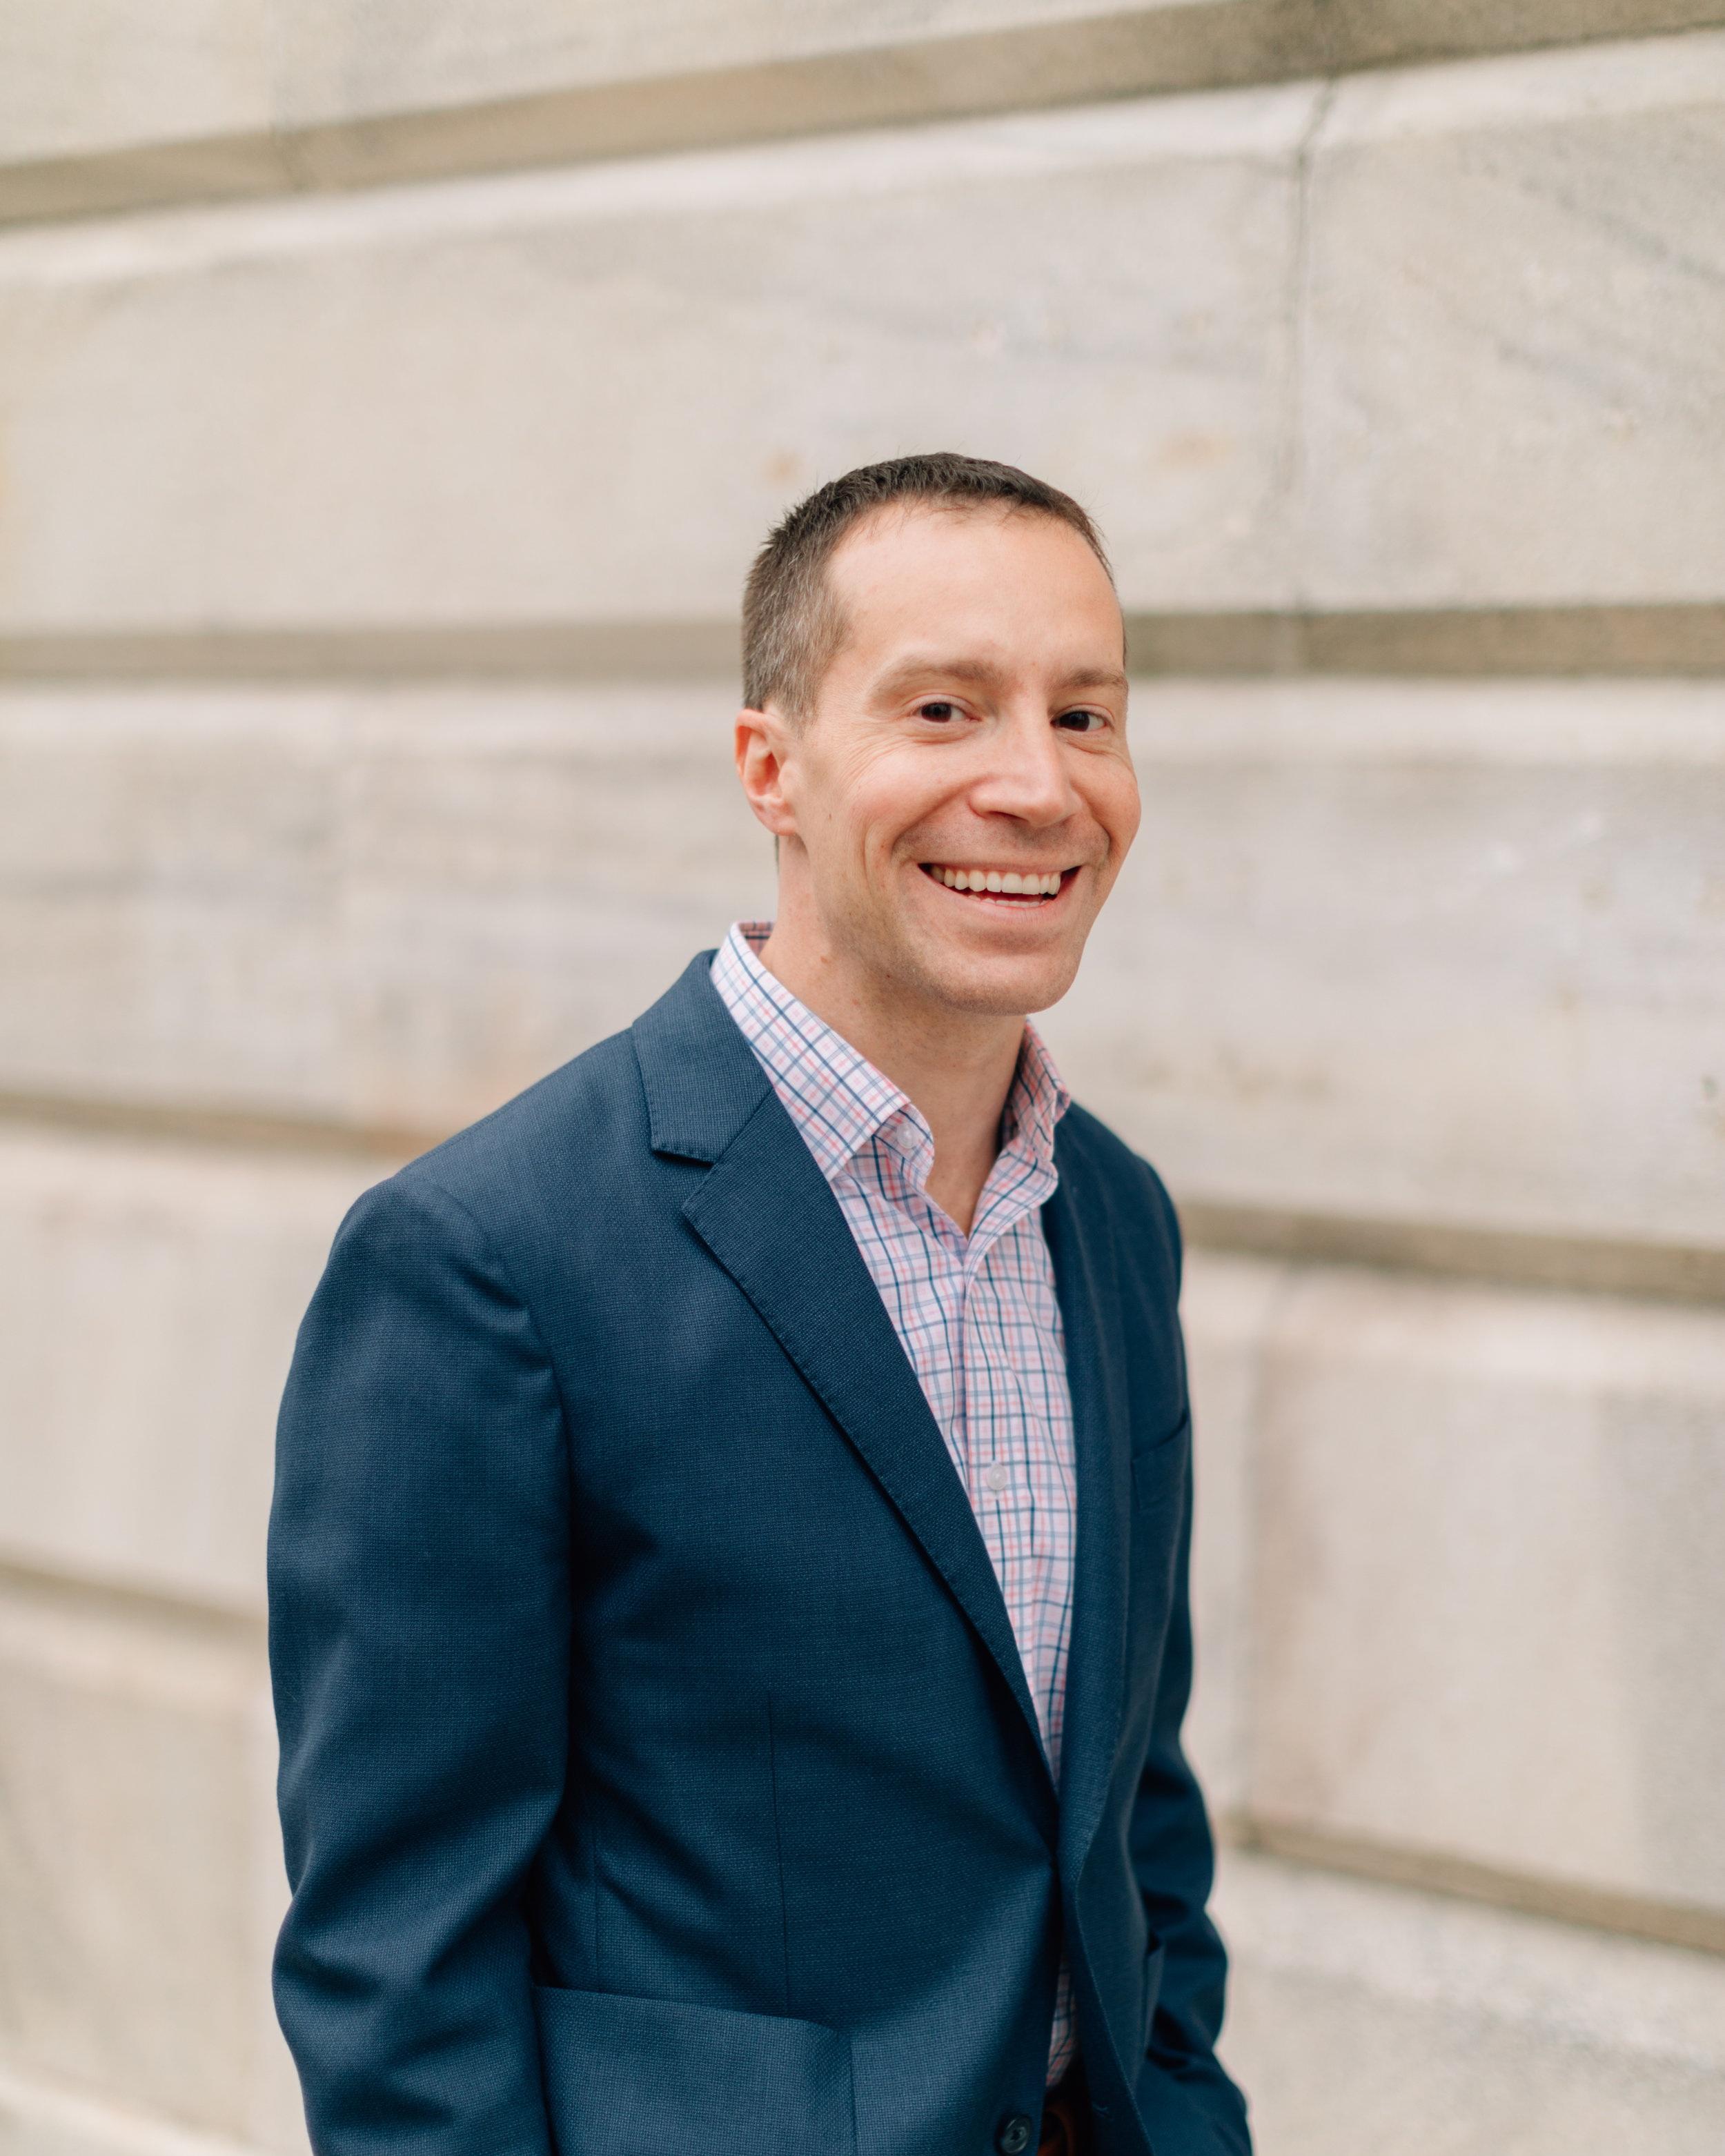 Nick Superina - General Partner